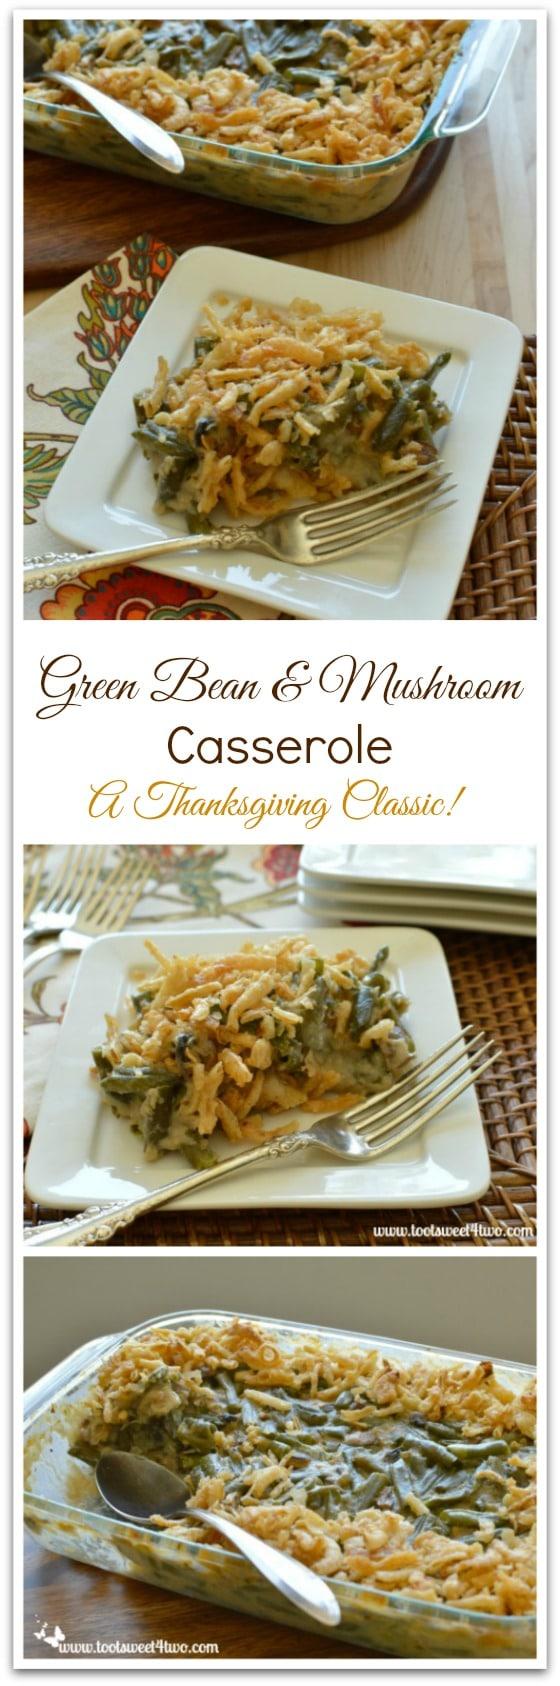 Green Bean and Mushroom Casserole collage